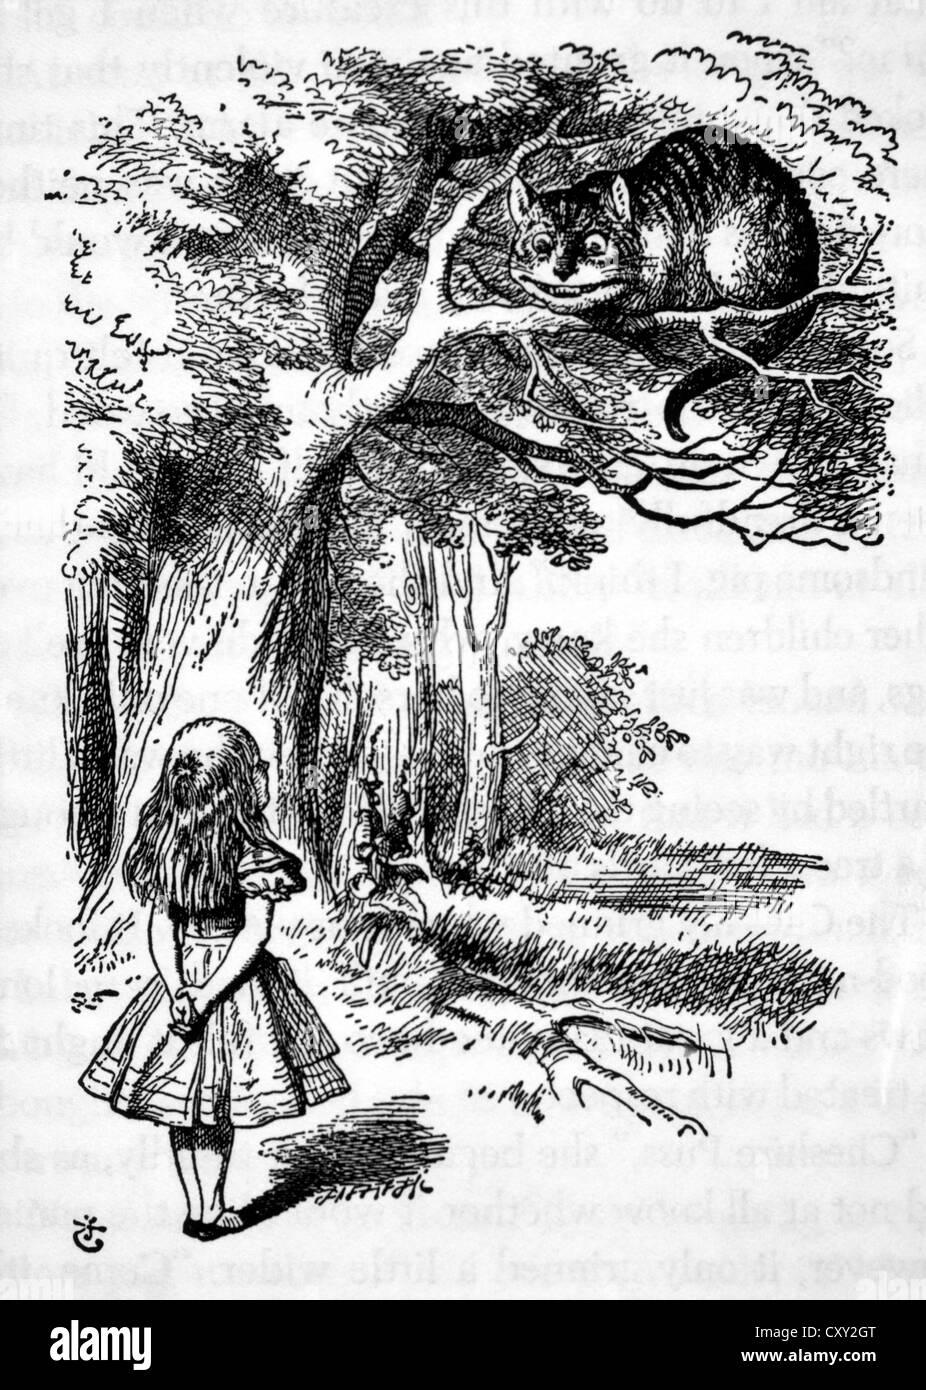 Alice in Wonderland by Lewis Carroll 89